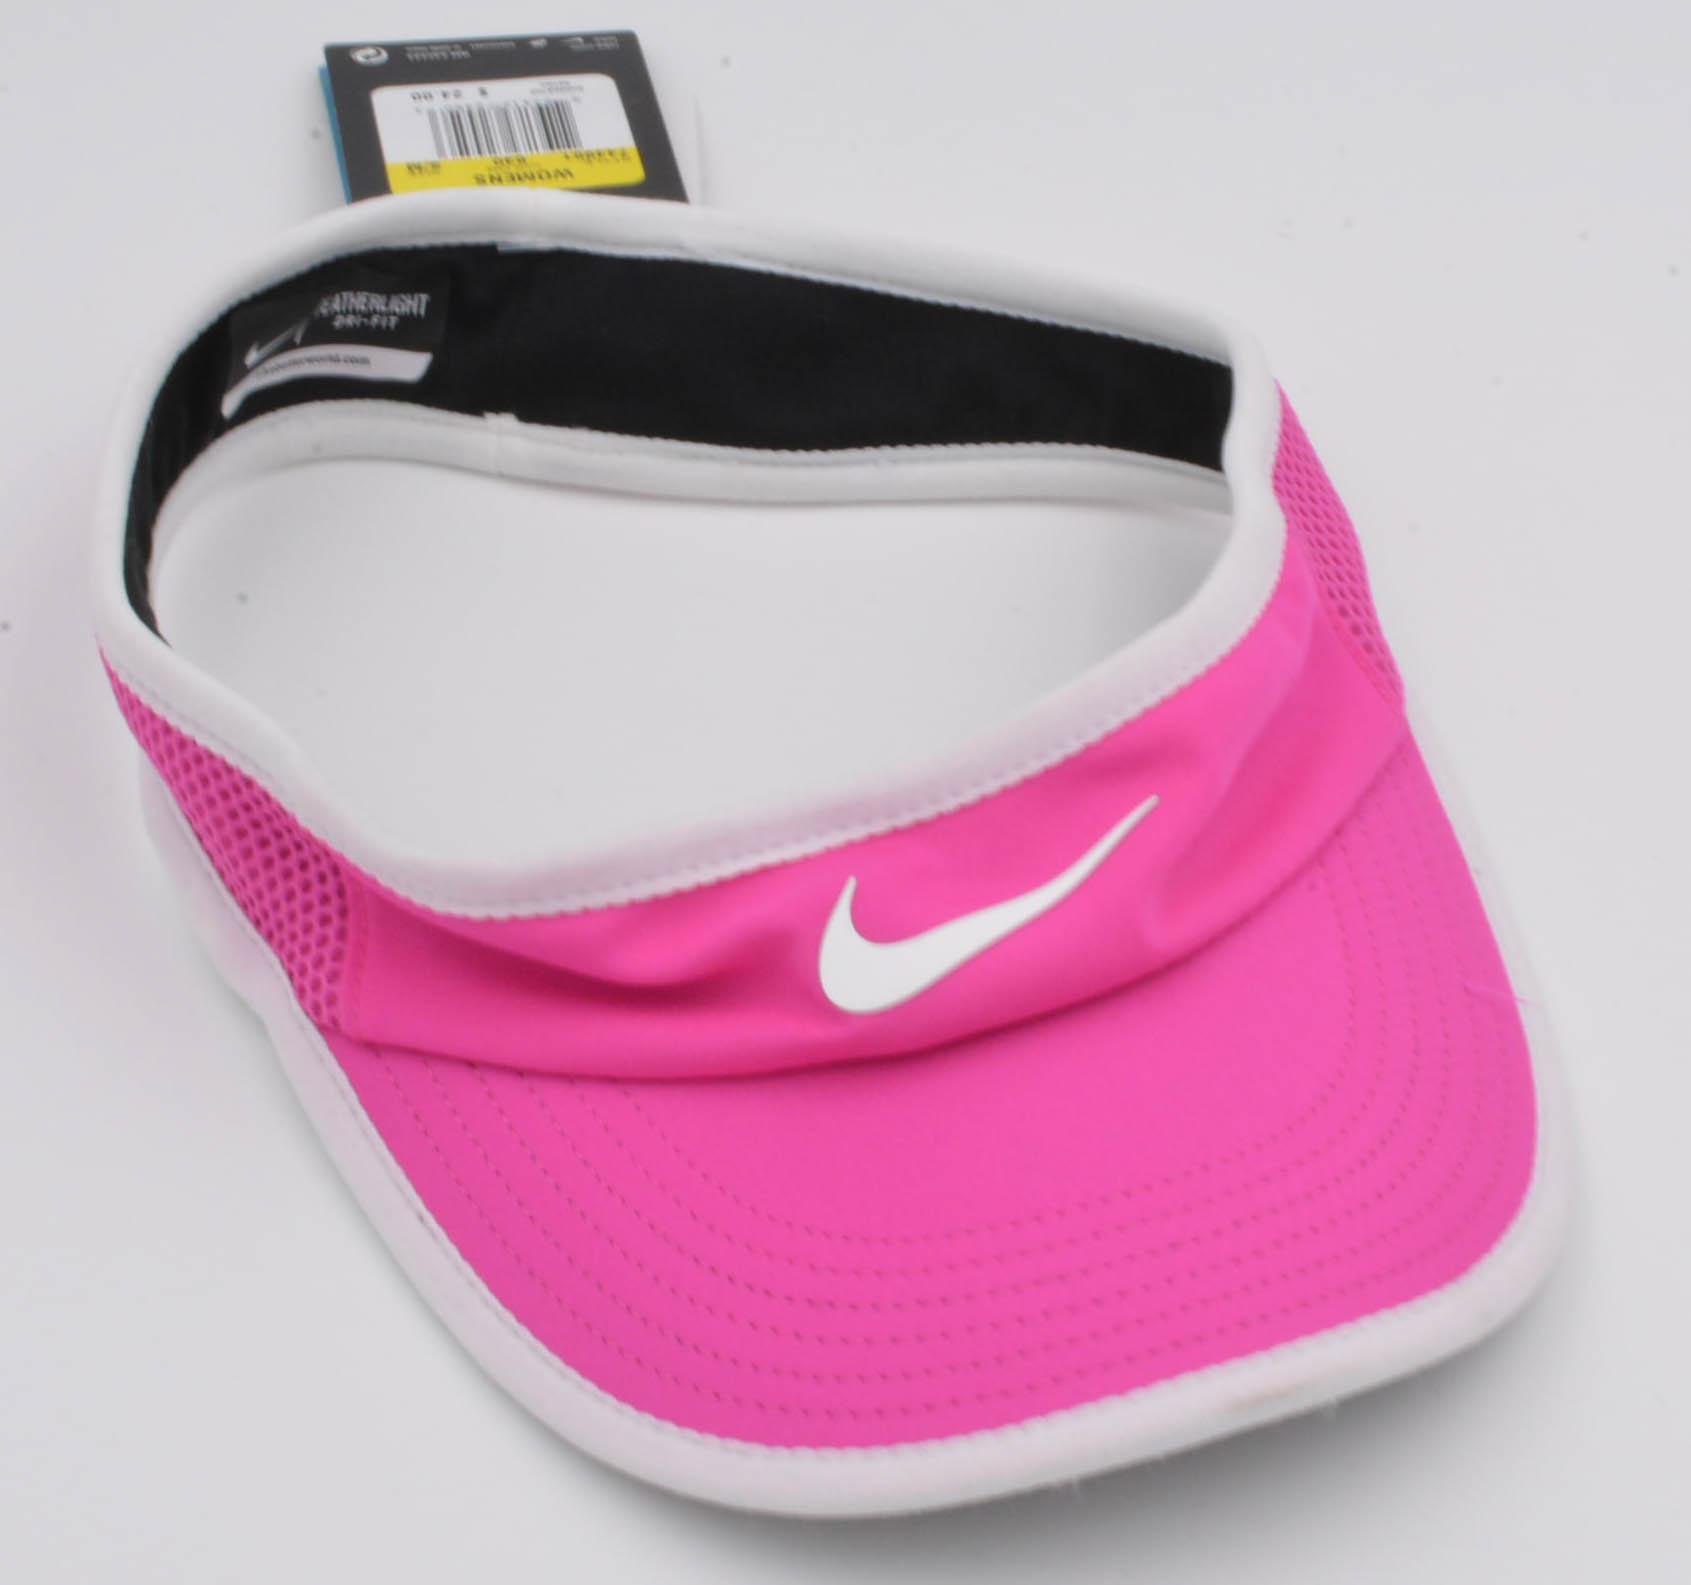 Nike-FEATHERLITE-DRI-FIT-TENNIS-VISOR-HAT-WOMENS-Size-S-M thumbnail 9